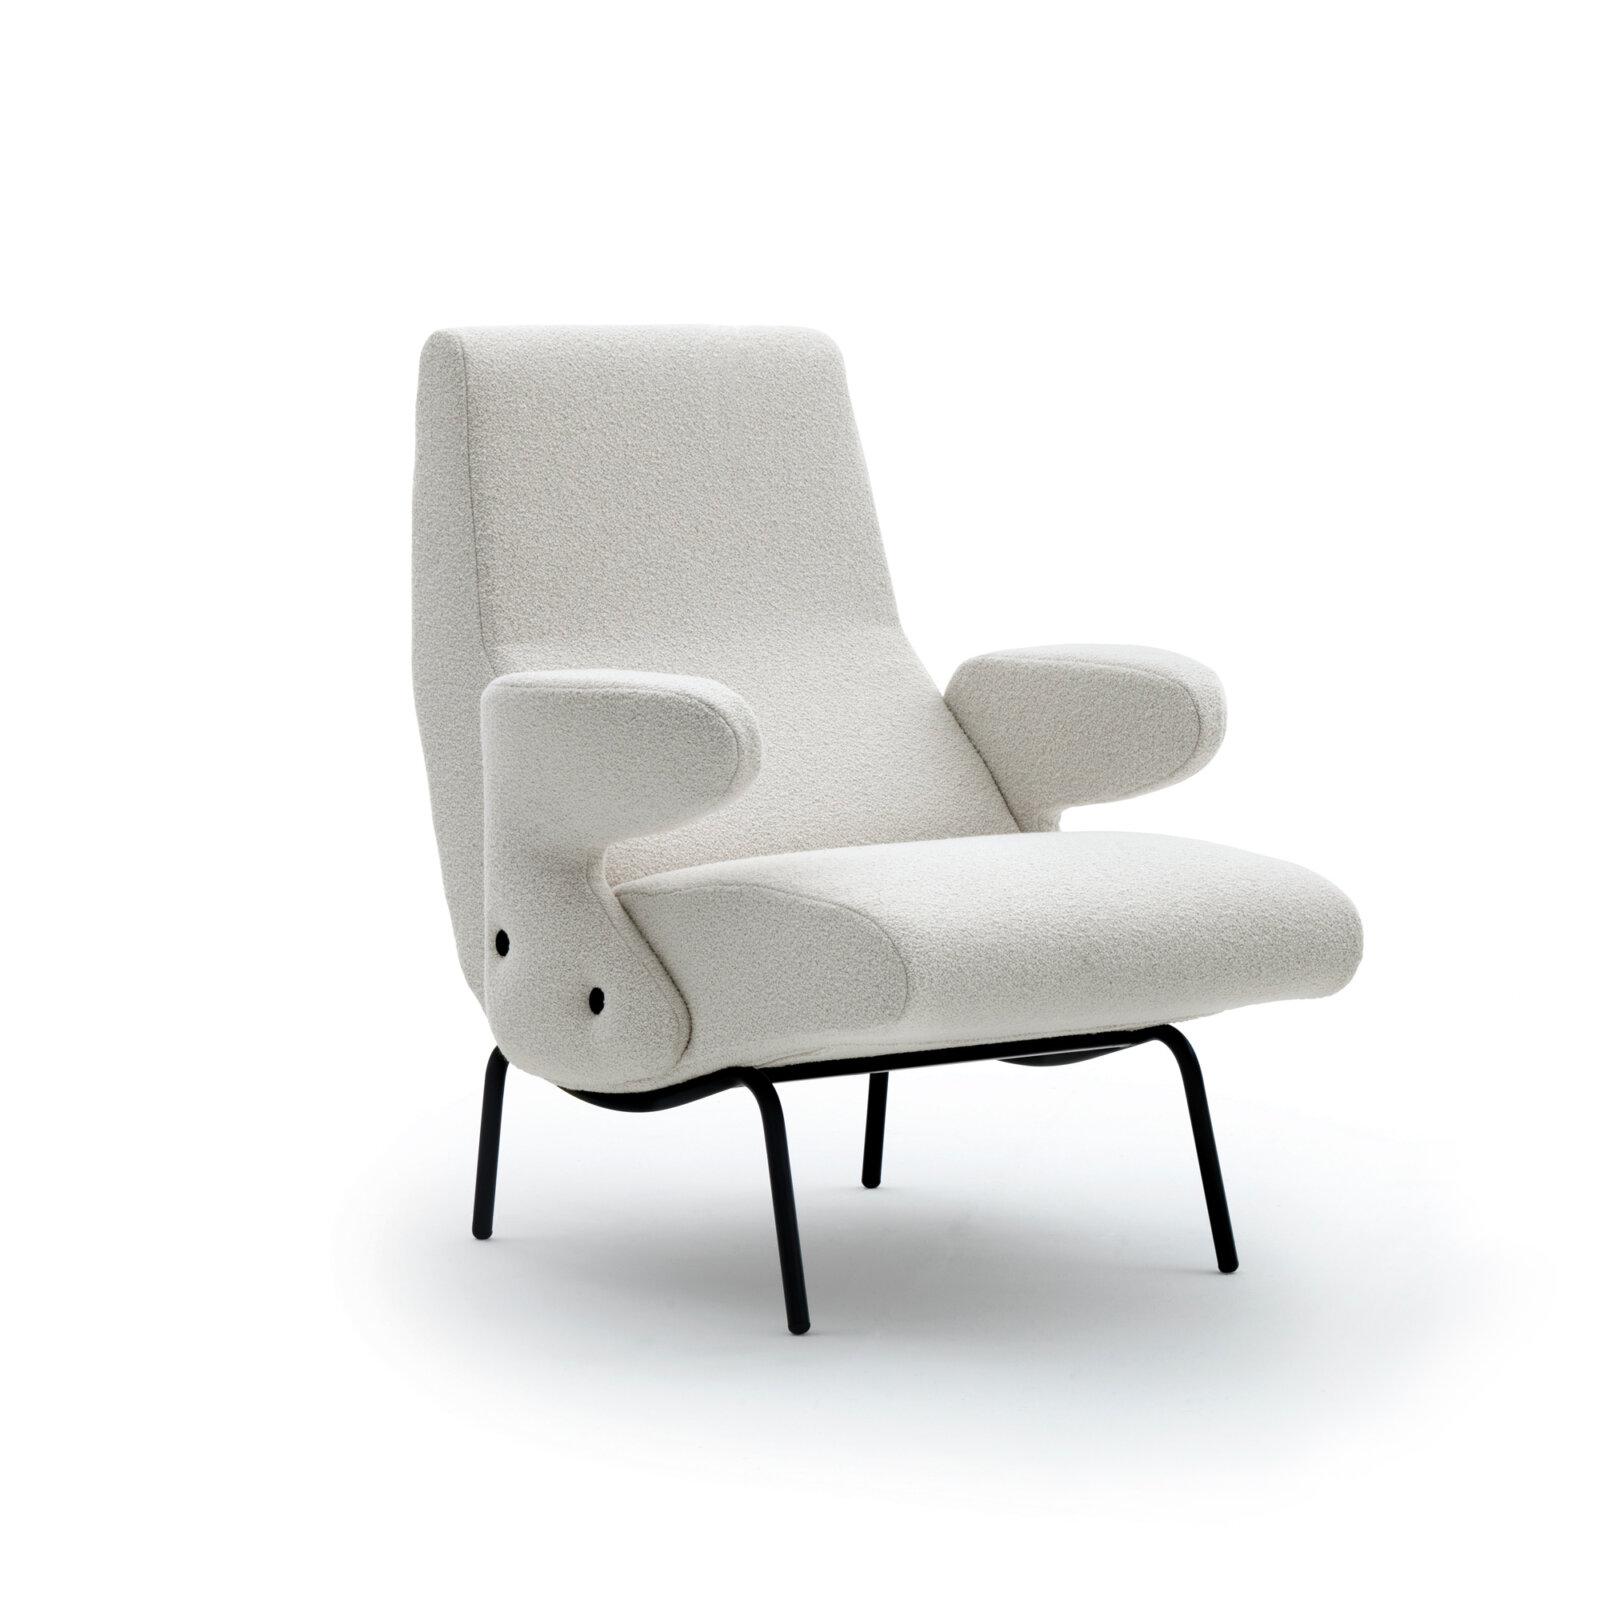 TinnappleMetz-arflex-delfino-armchair_03